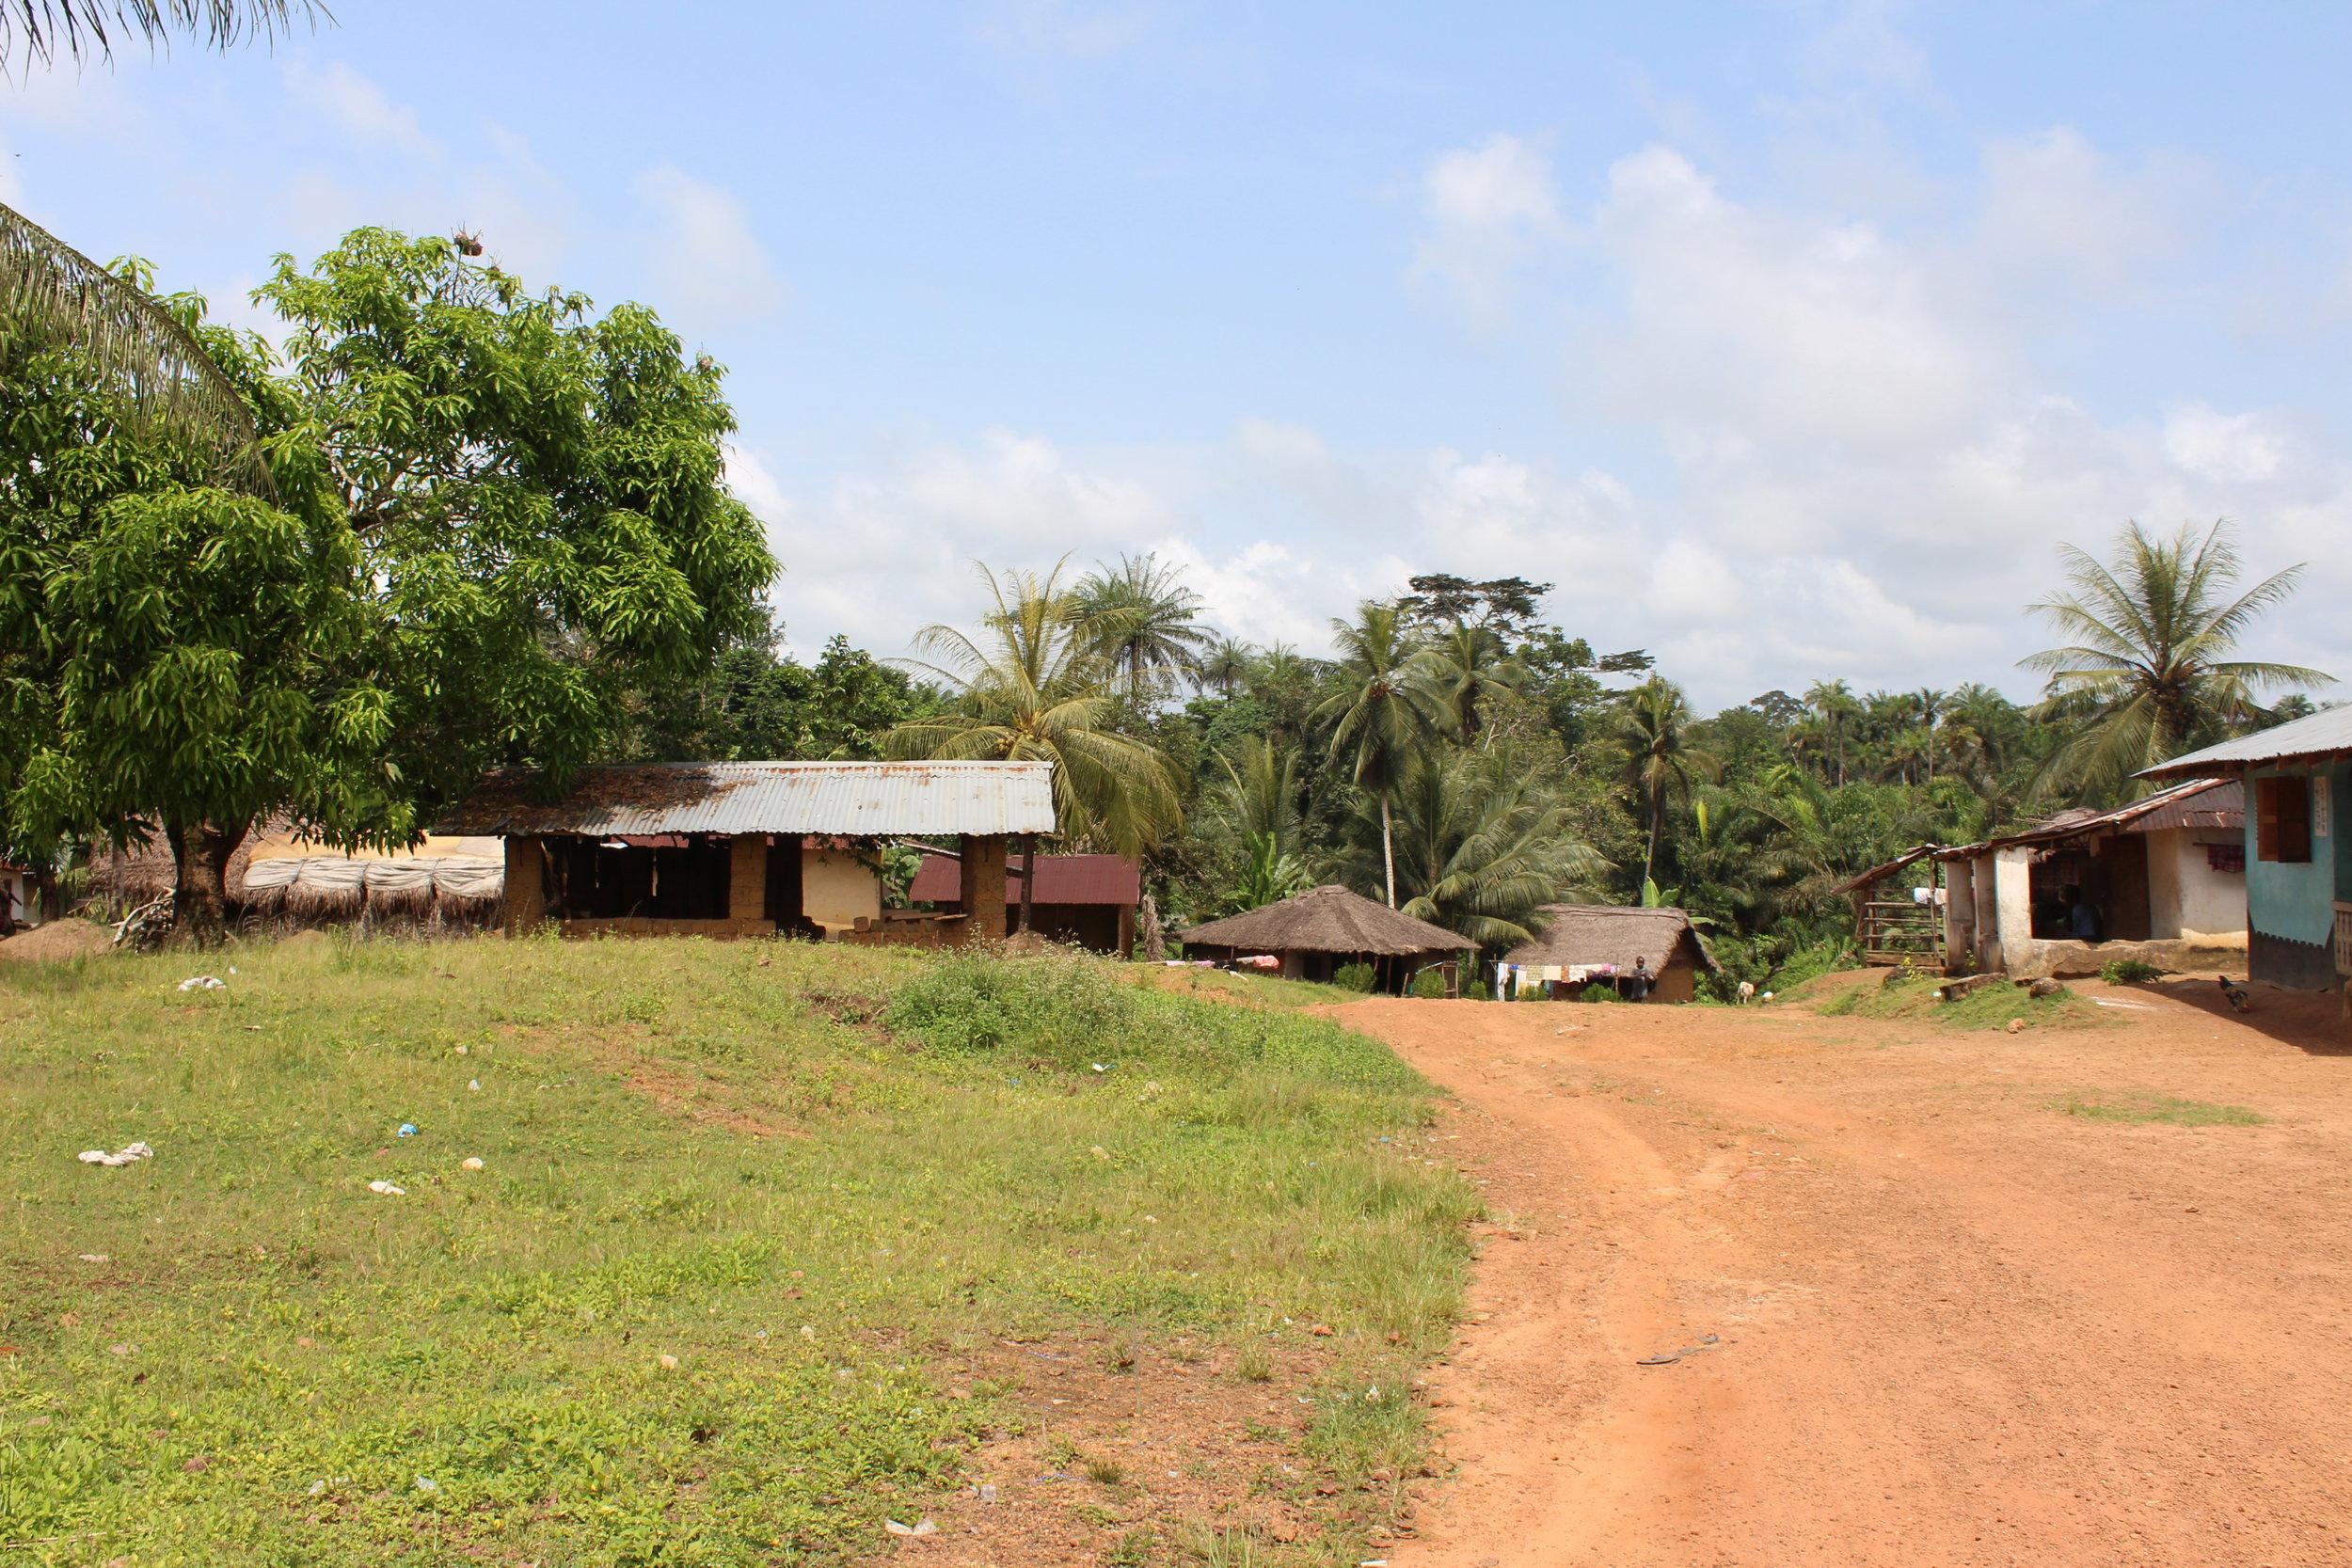 Jene Wonde village, near the Sierra Leone border.JPG